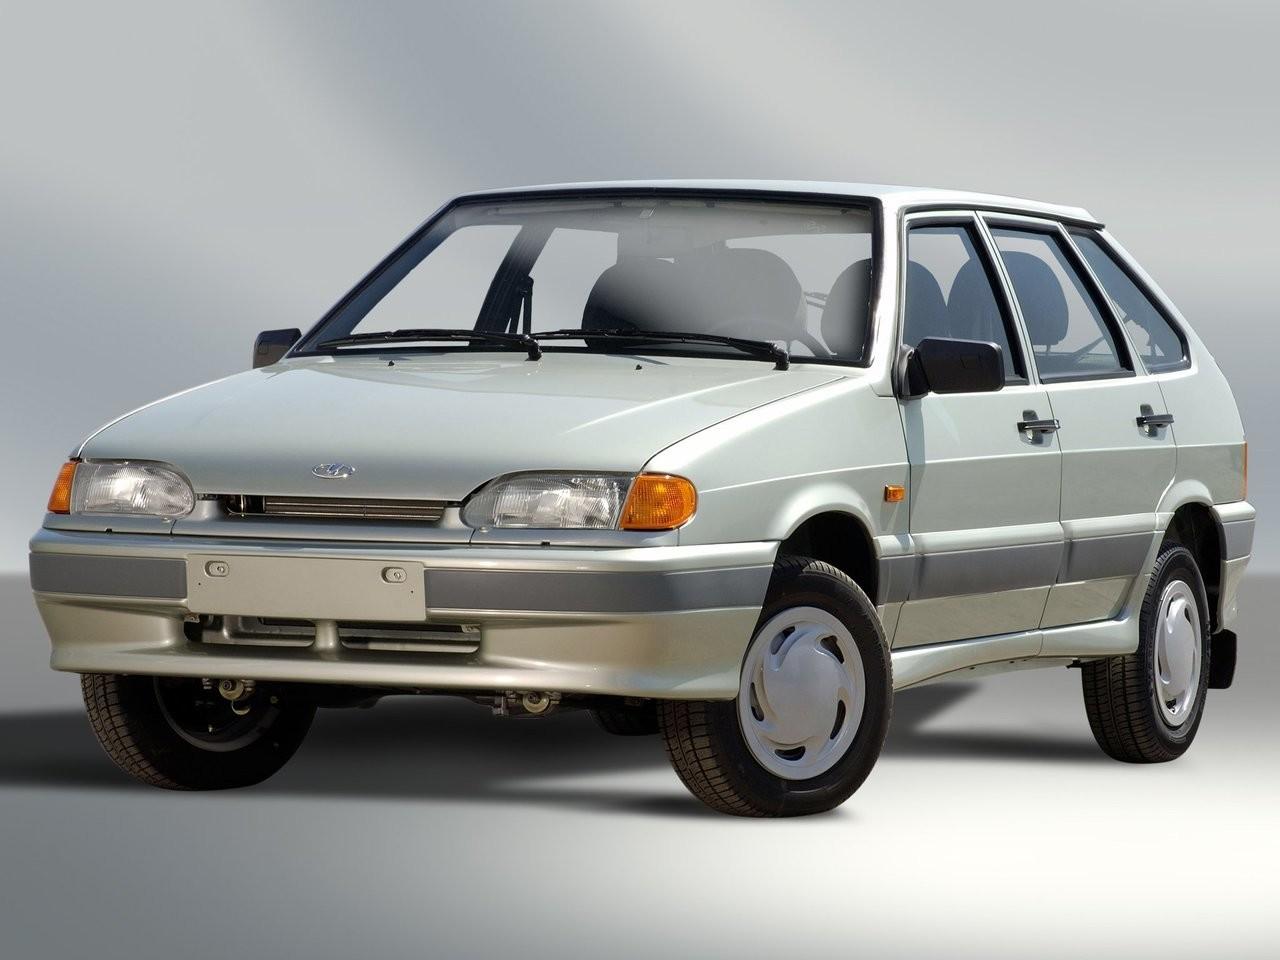 "<p>Хэтчбек LADA 2114. Фото: © <a href=""https://auto.ru/catalog/cars/vaz/2114/3913672/2307300/"" target=""_self"">www.auto.ru</a></p>"